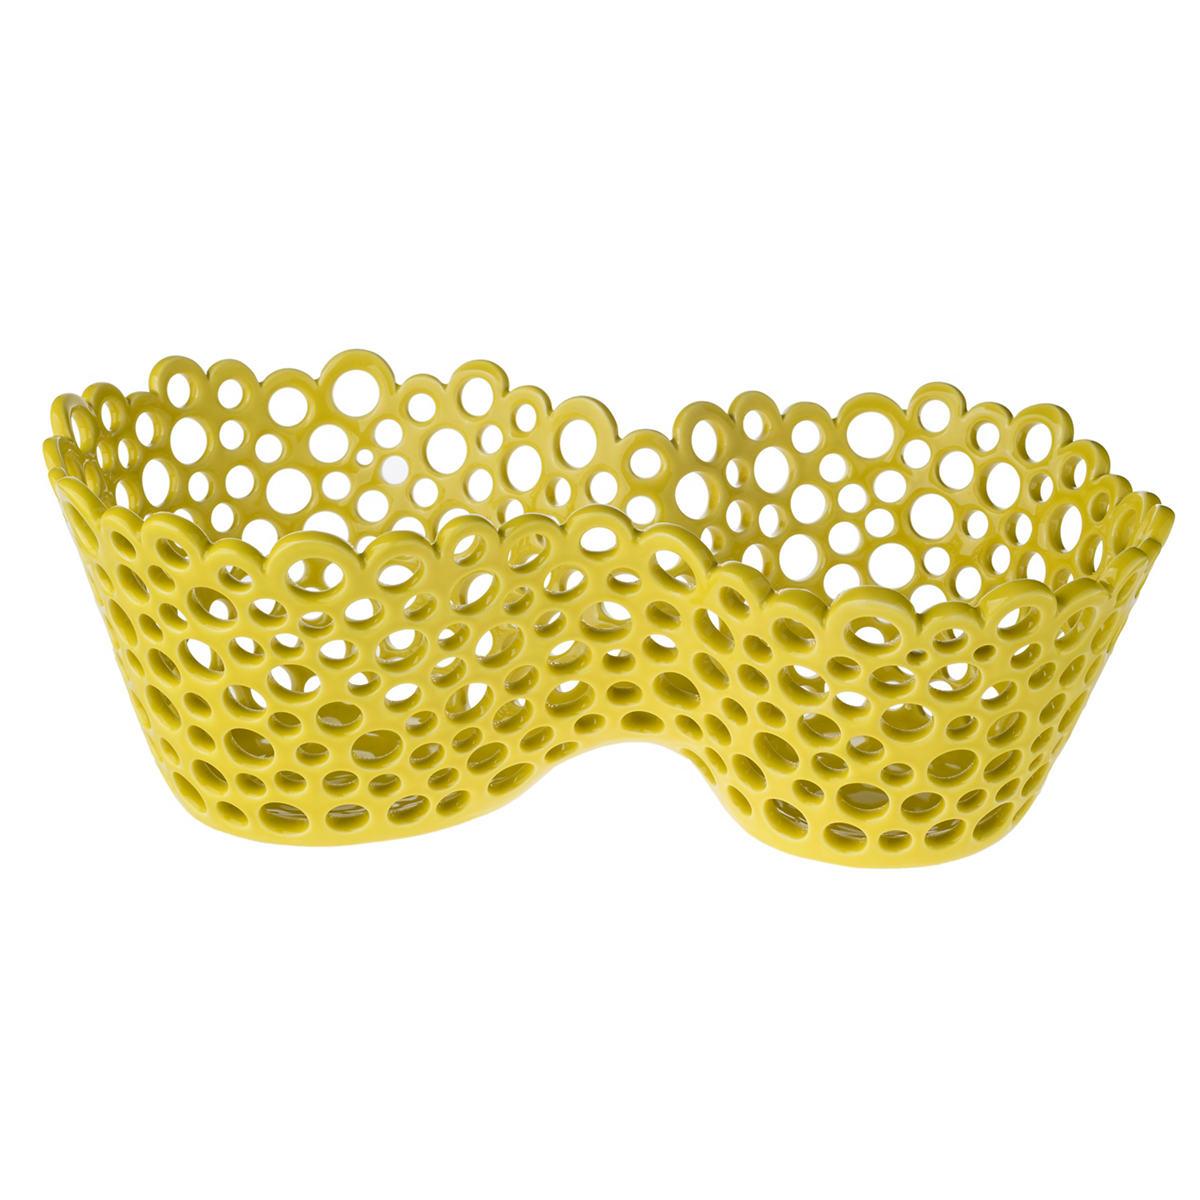 Chartreuse Gemini Bowl